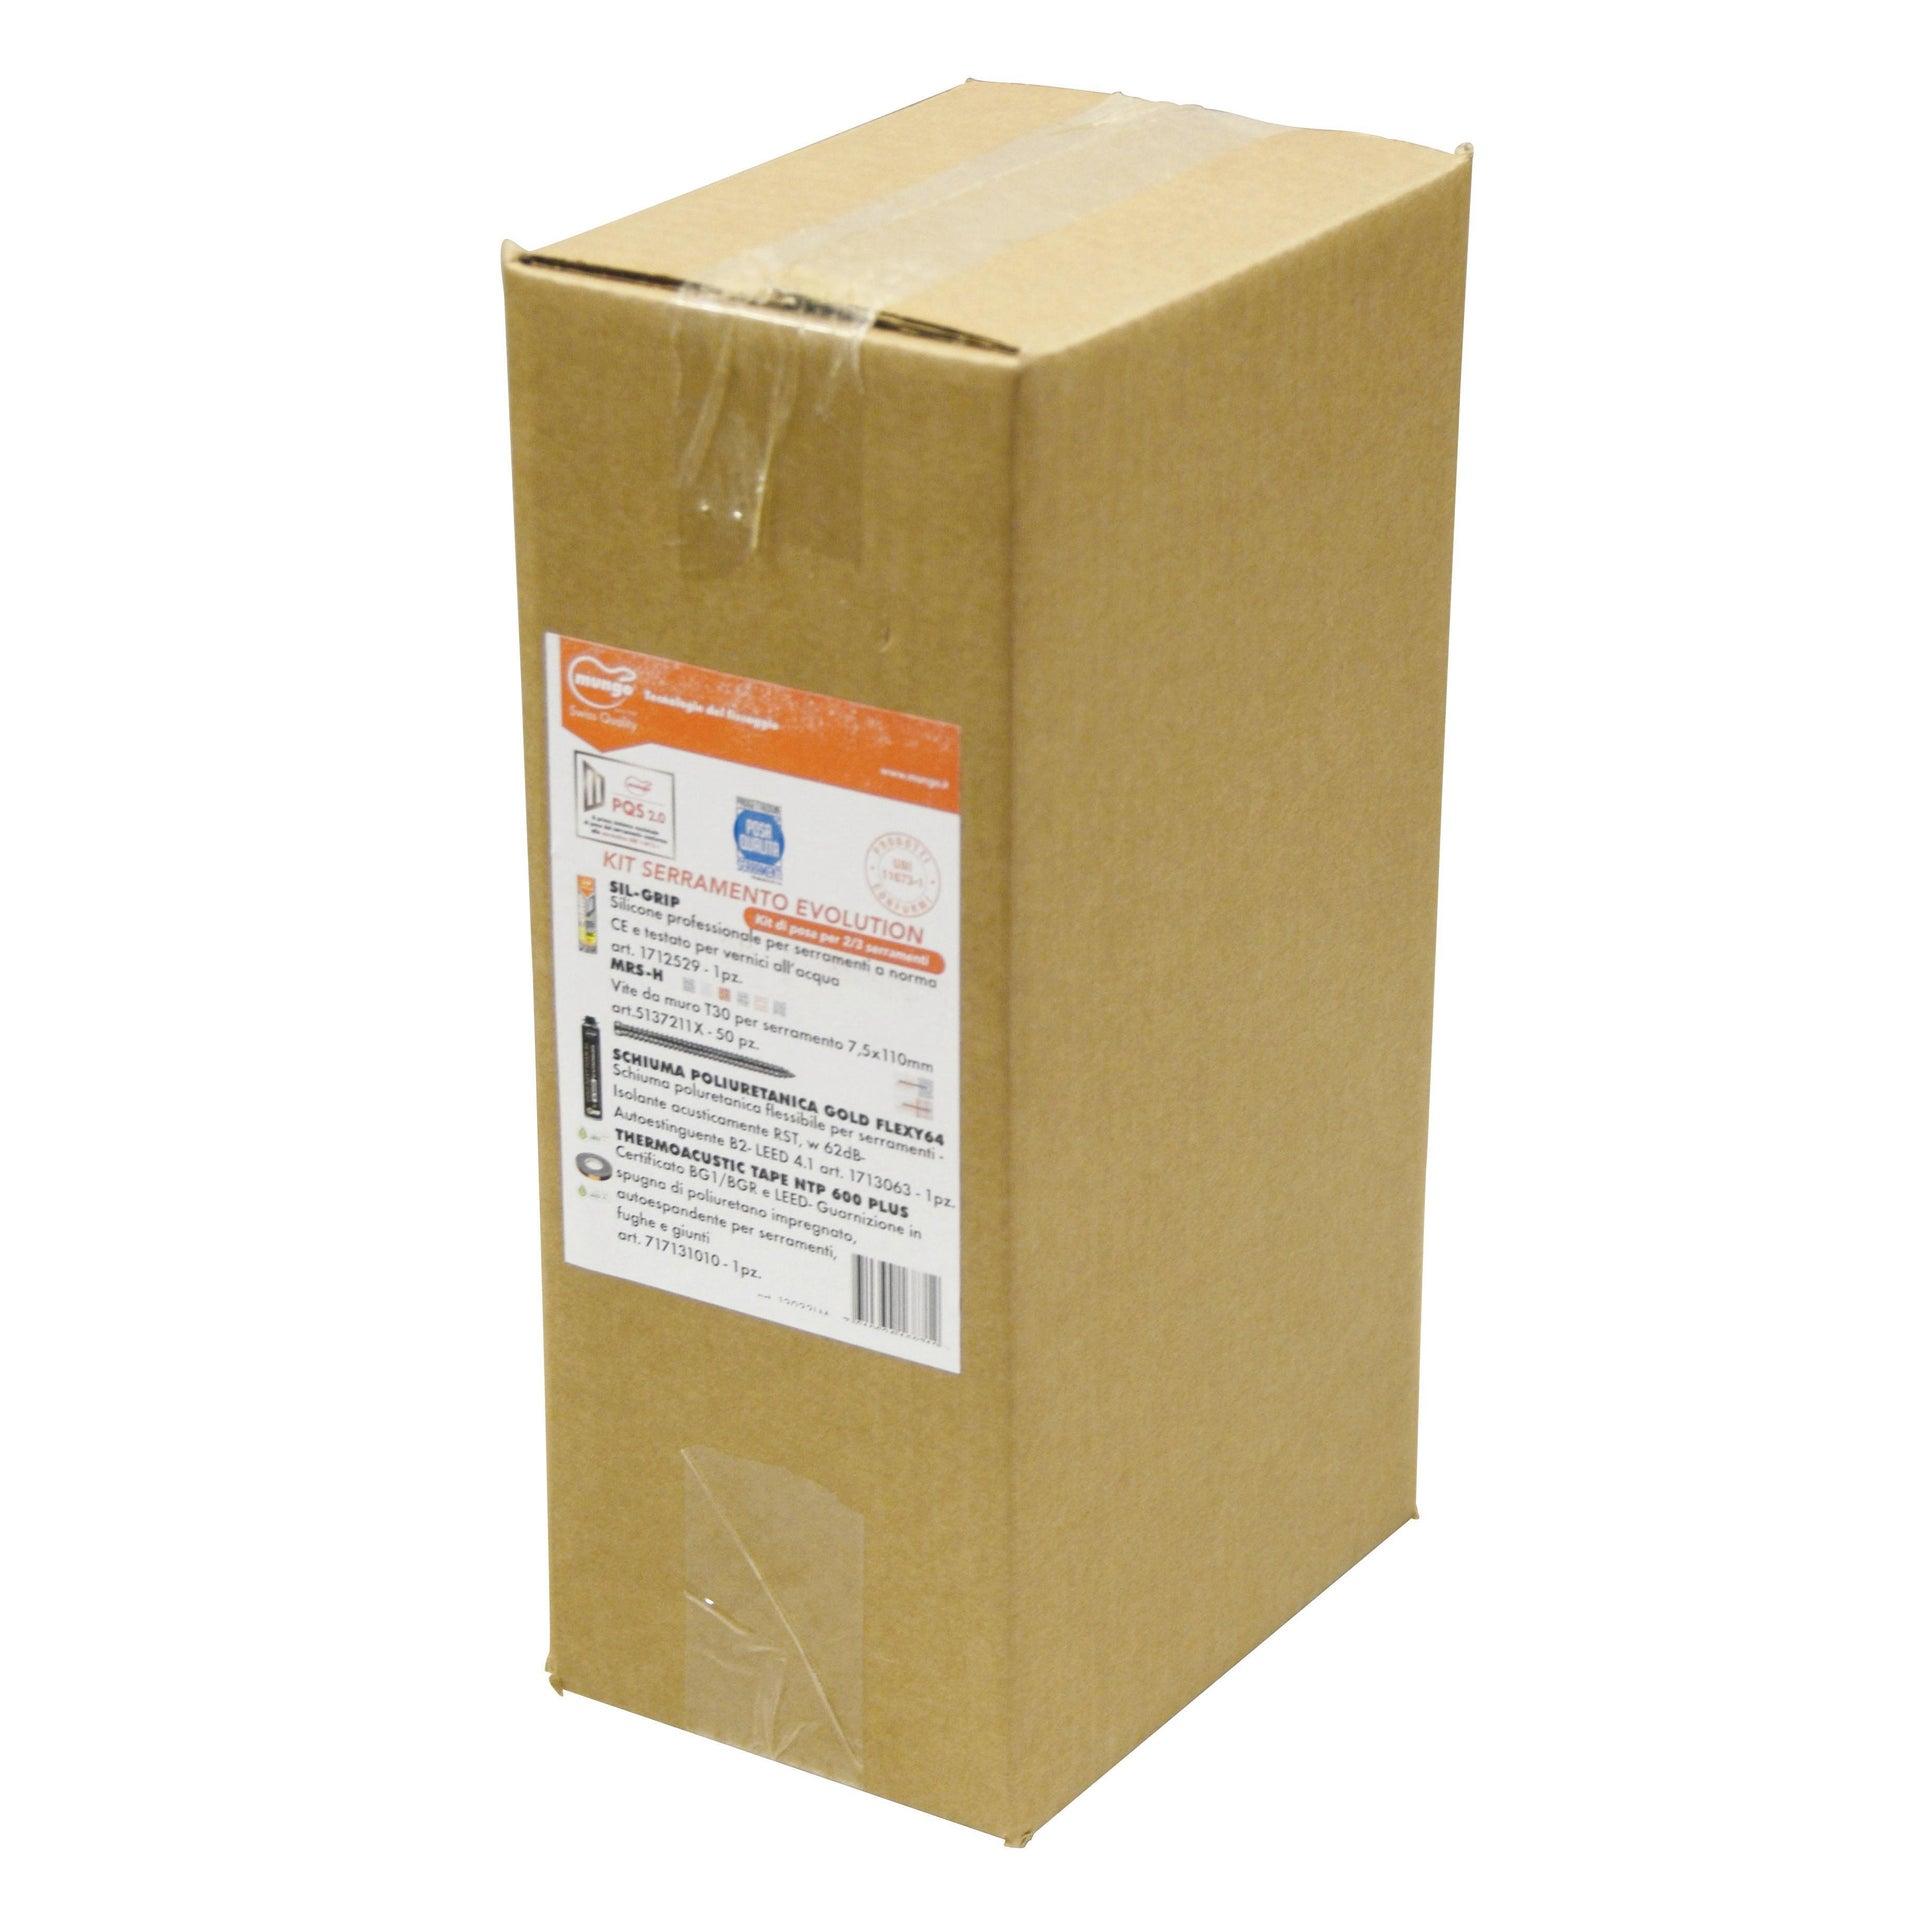 Silicone Kit serramenti bianco 500 ml - 2